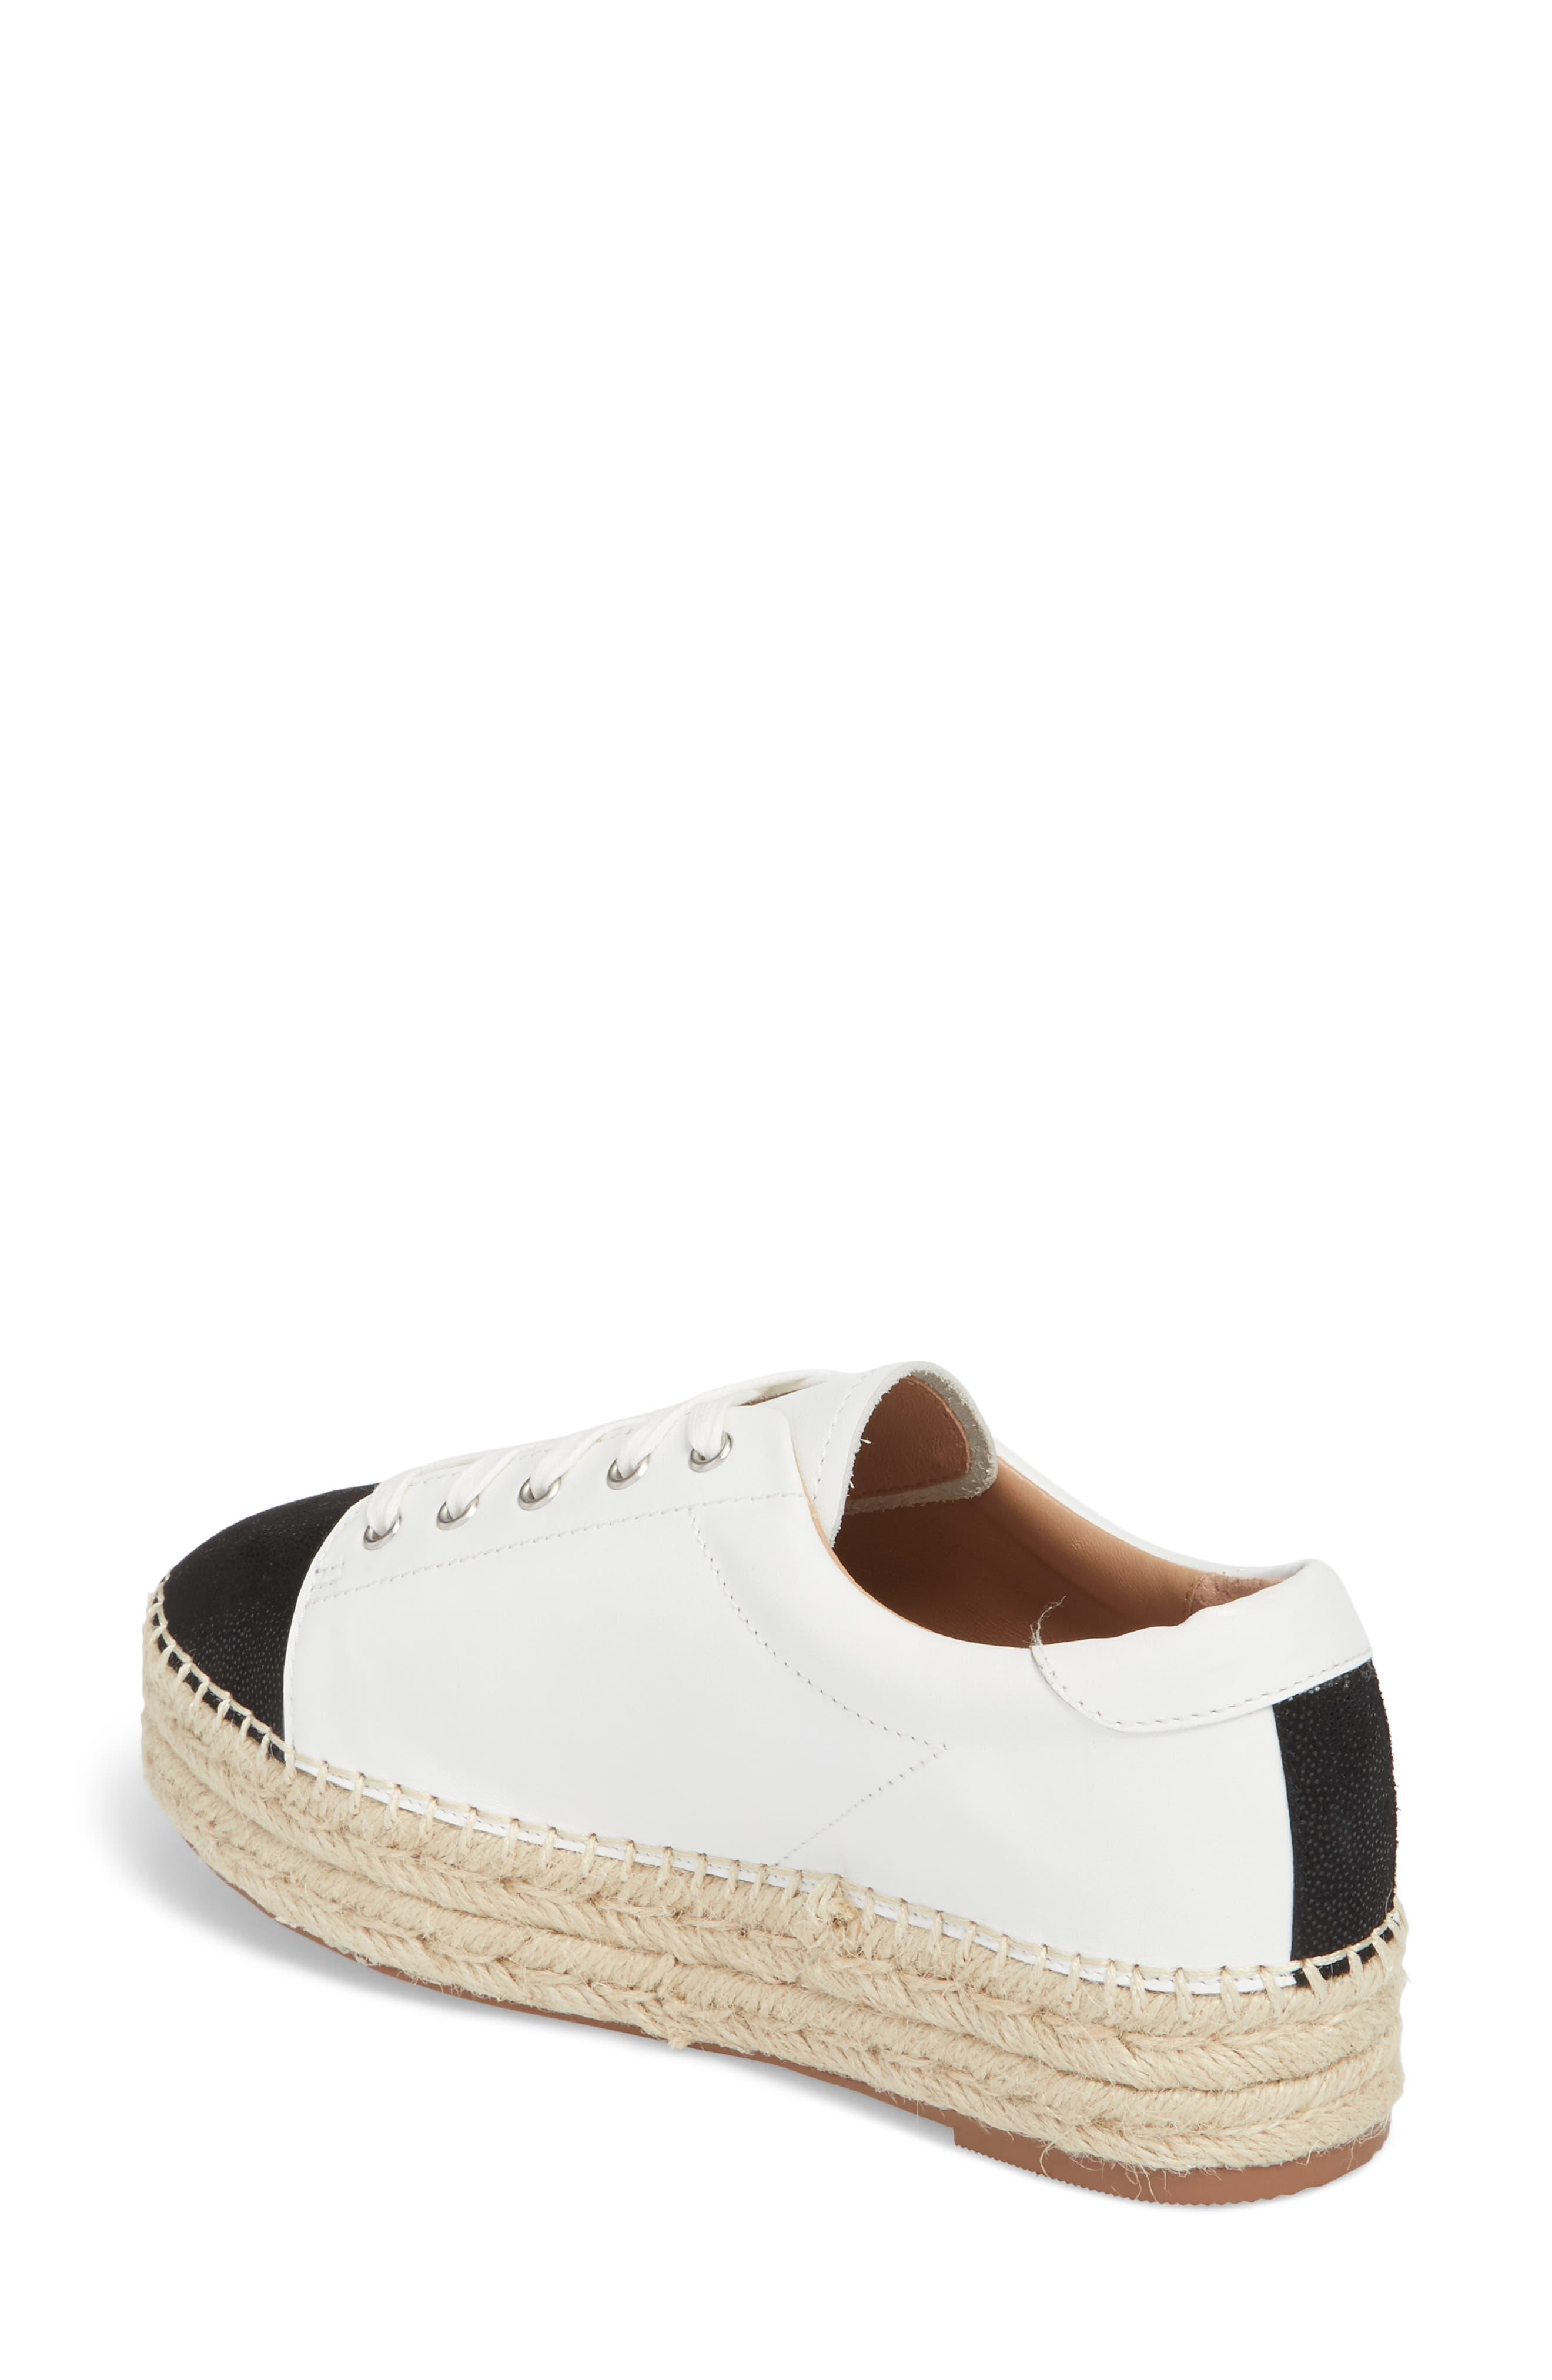 Sierra Espadrille Platform Sneaker,                             Alternate thumbnail 2, color,                             108